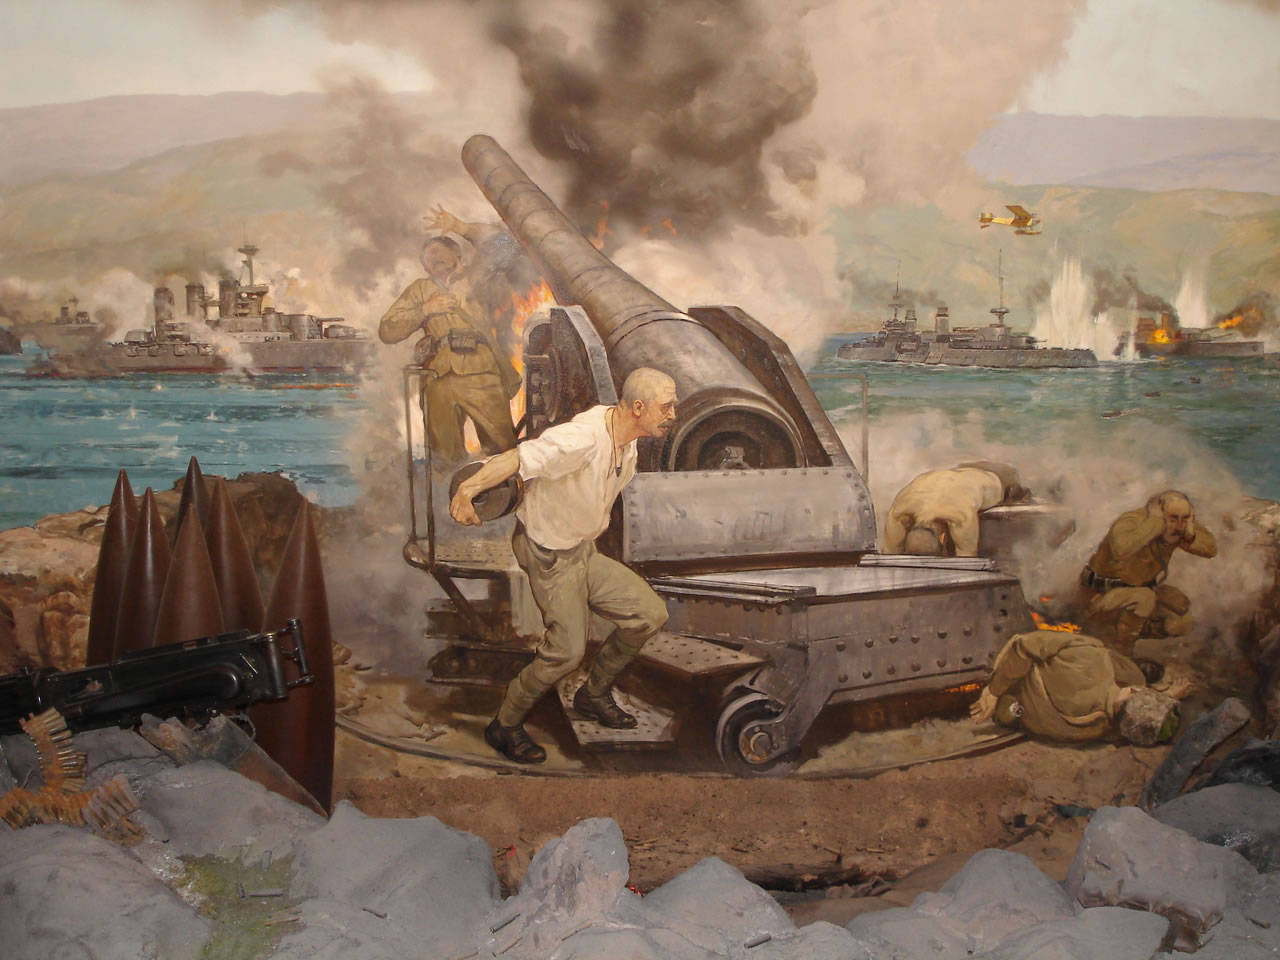 من ذكريات حرب الاستقلال 28548041a031e8dc1b70dc36d46abba96355711